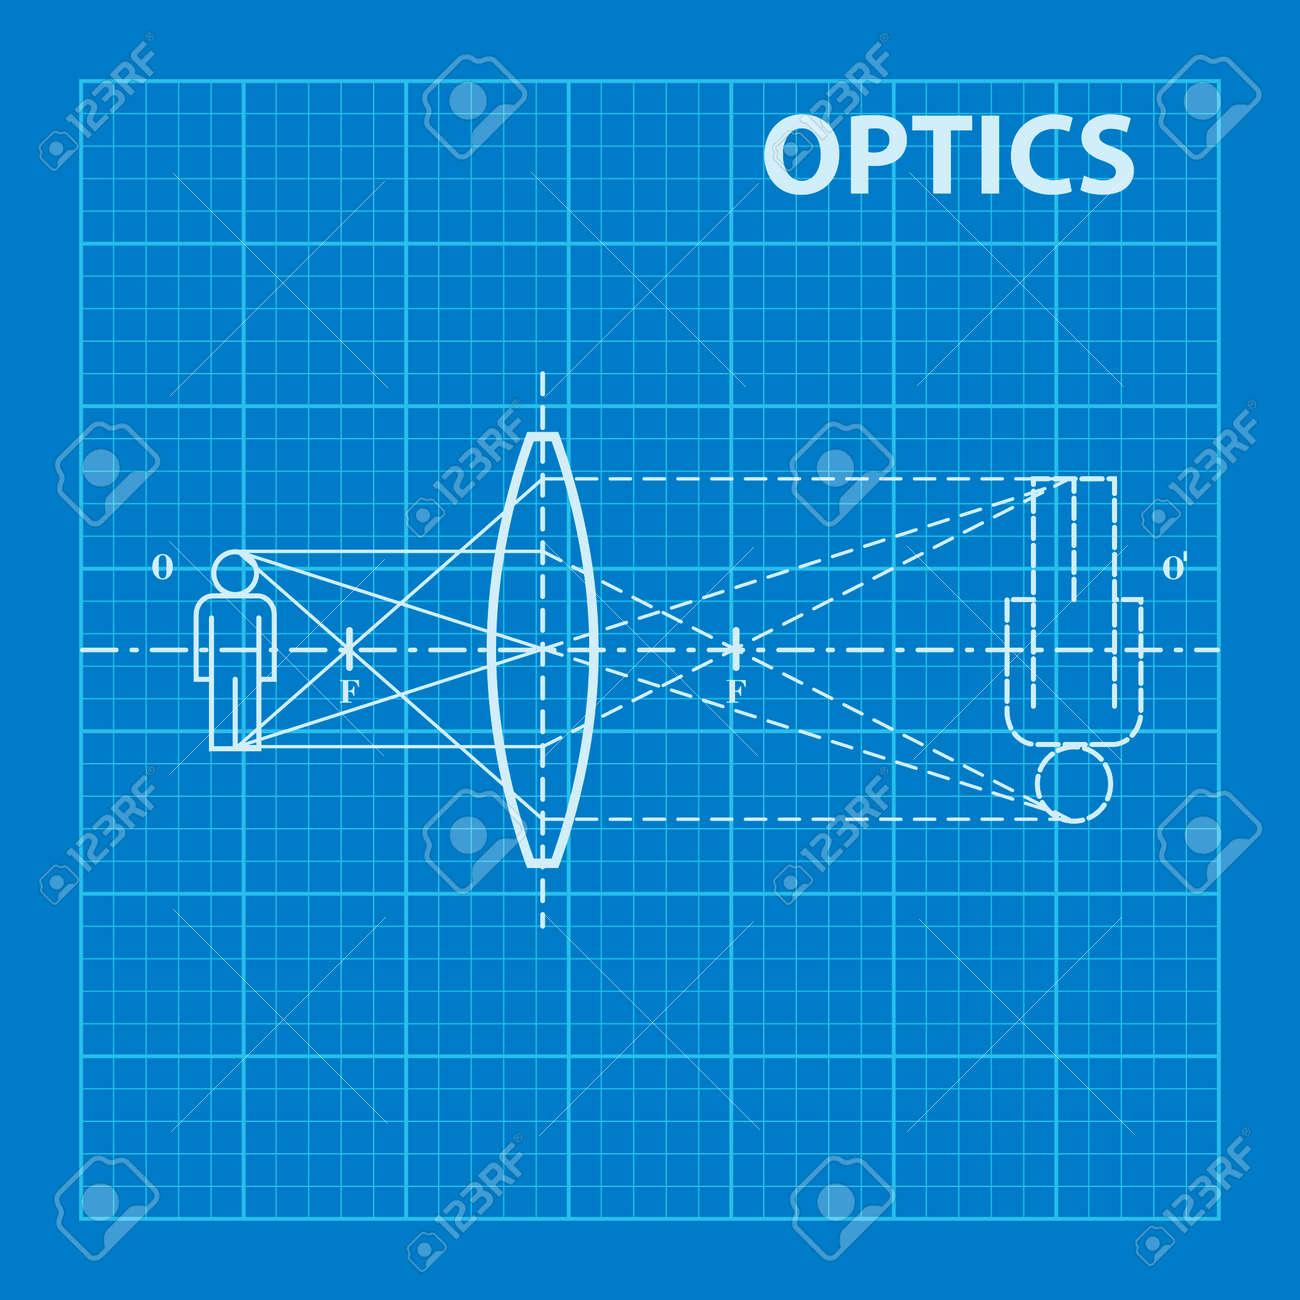 Infographic physics geometrical optics on blueprint background geometrical optics on blueprint background vector illustration stock vector 44024188 malvernweather Choice Image